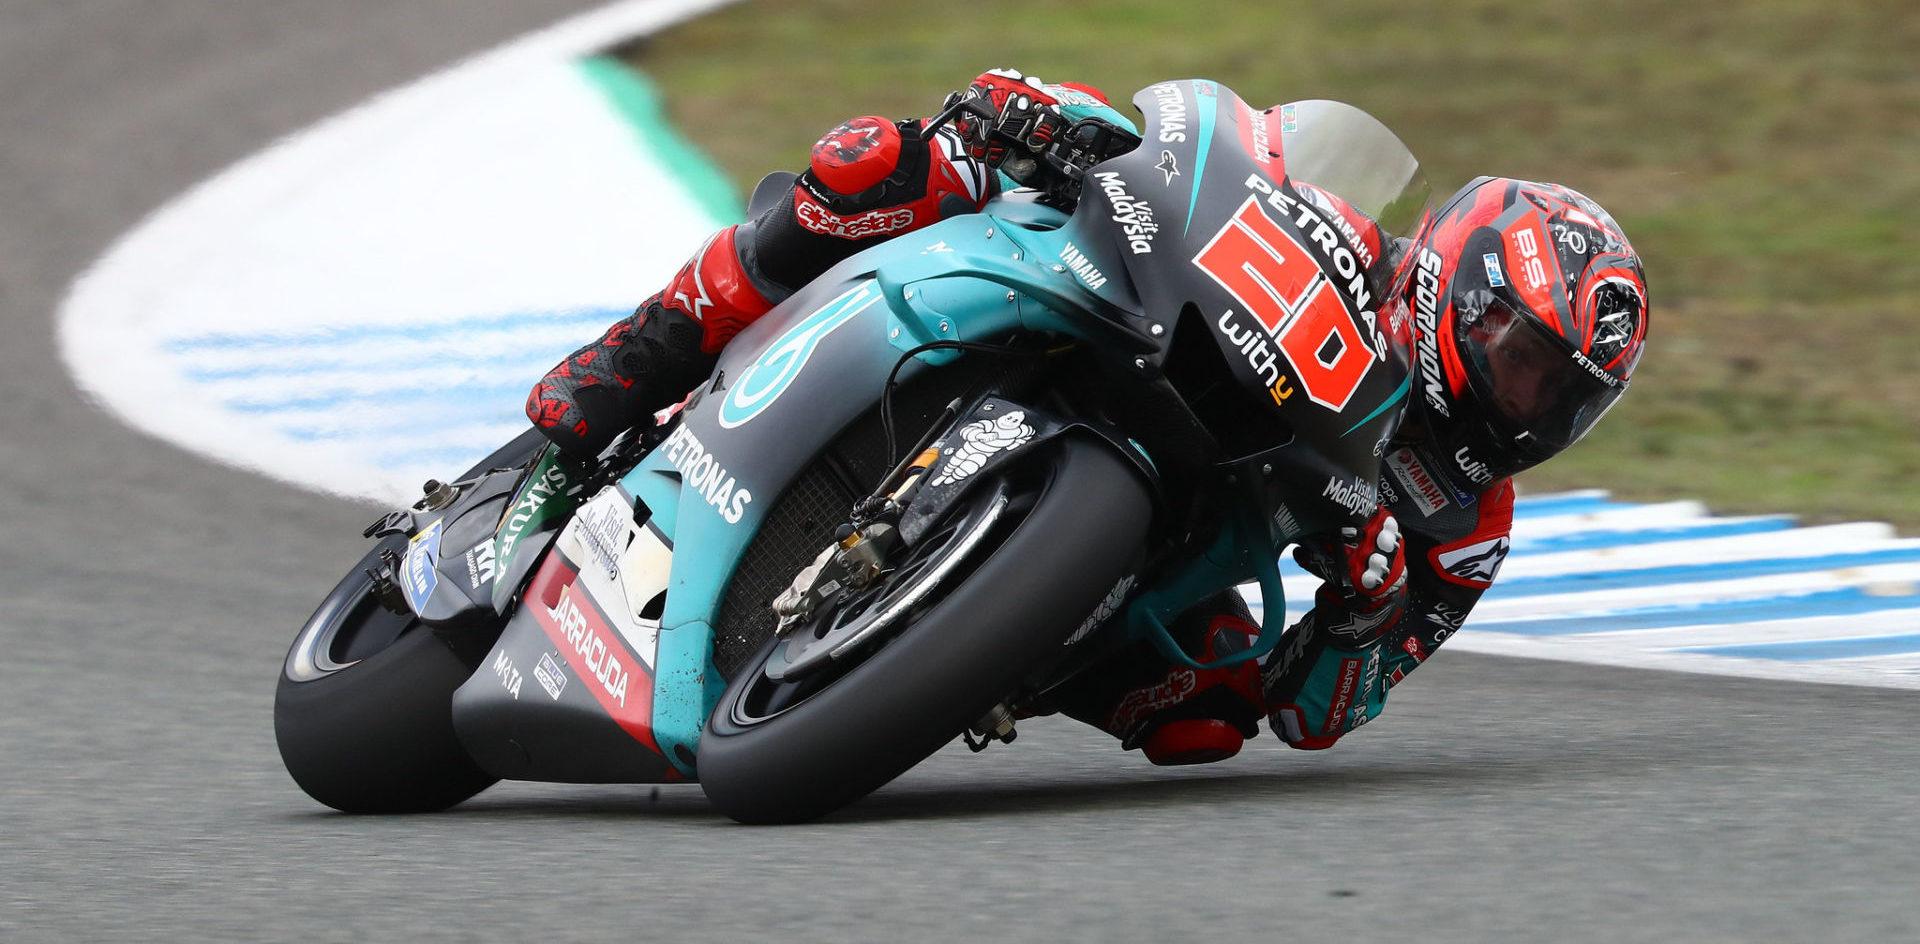 Motogp Quartararo Joining Vinales On Yamaha Factory Team In 2021 Roadracing World Magazine Motorcycle Riding Racing Tech News